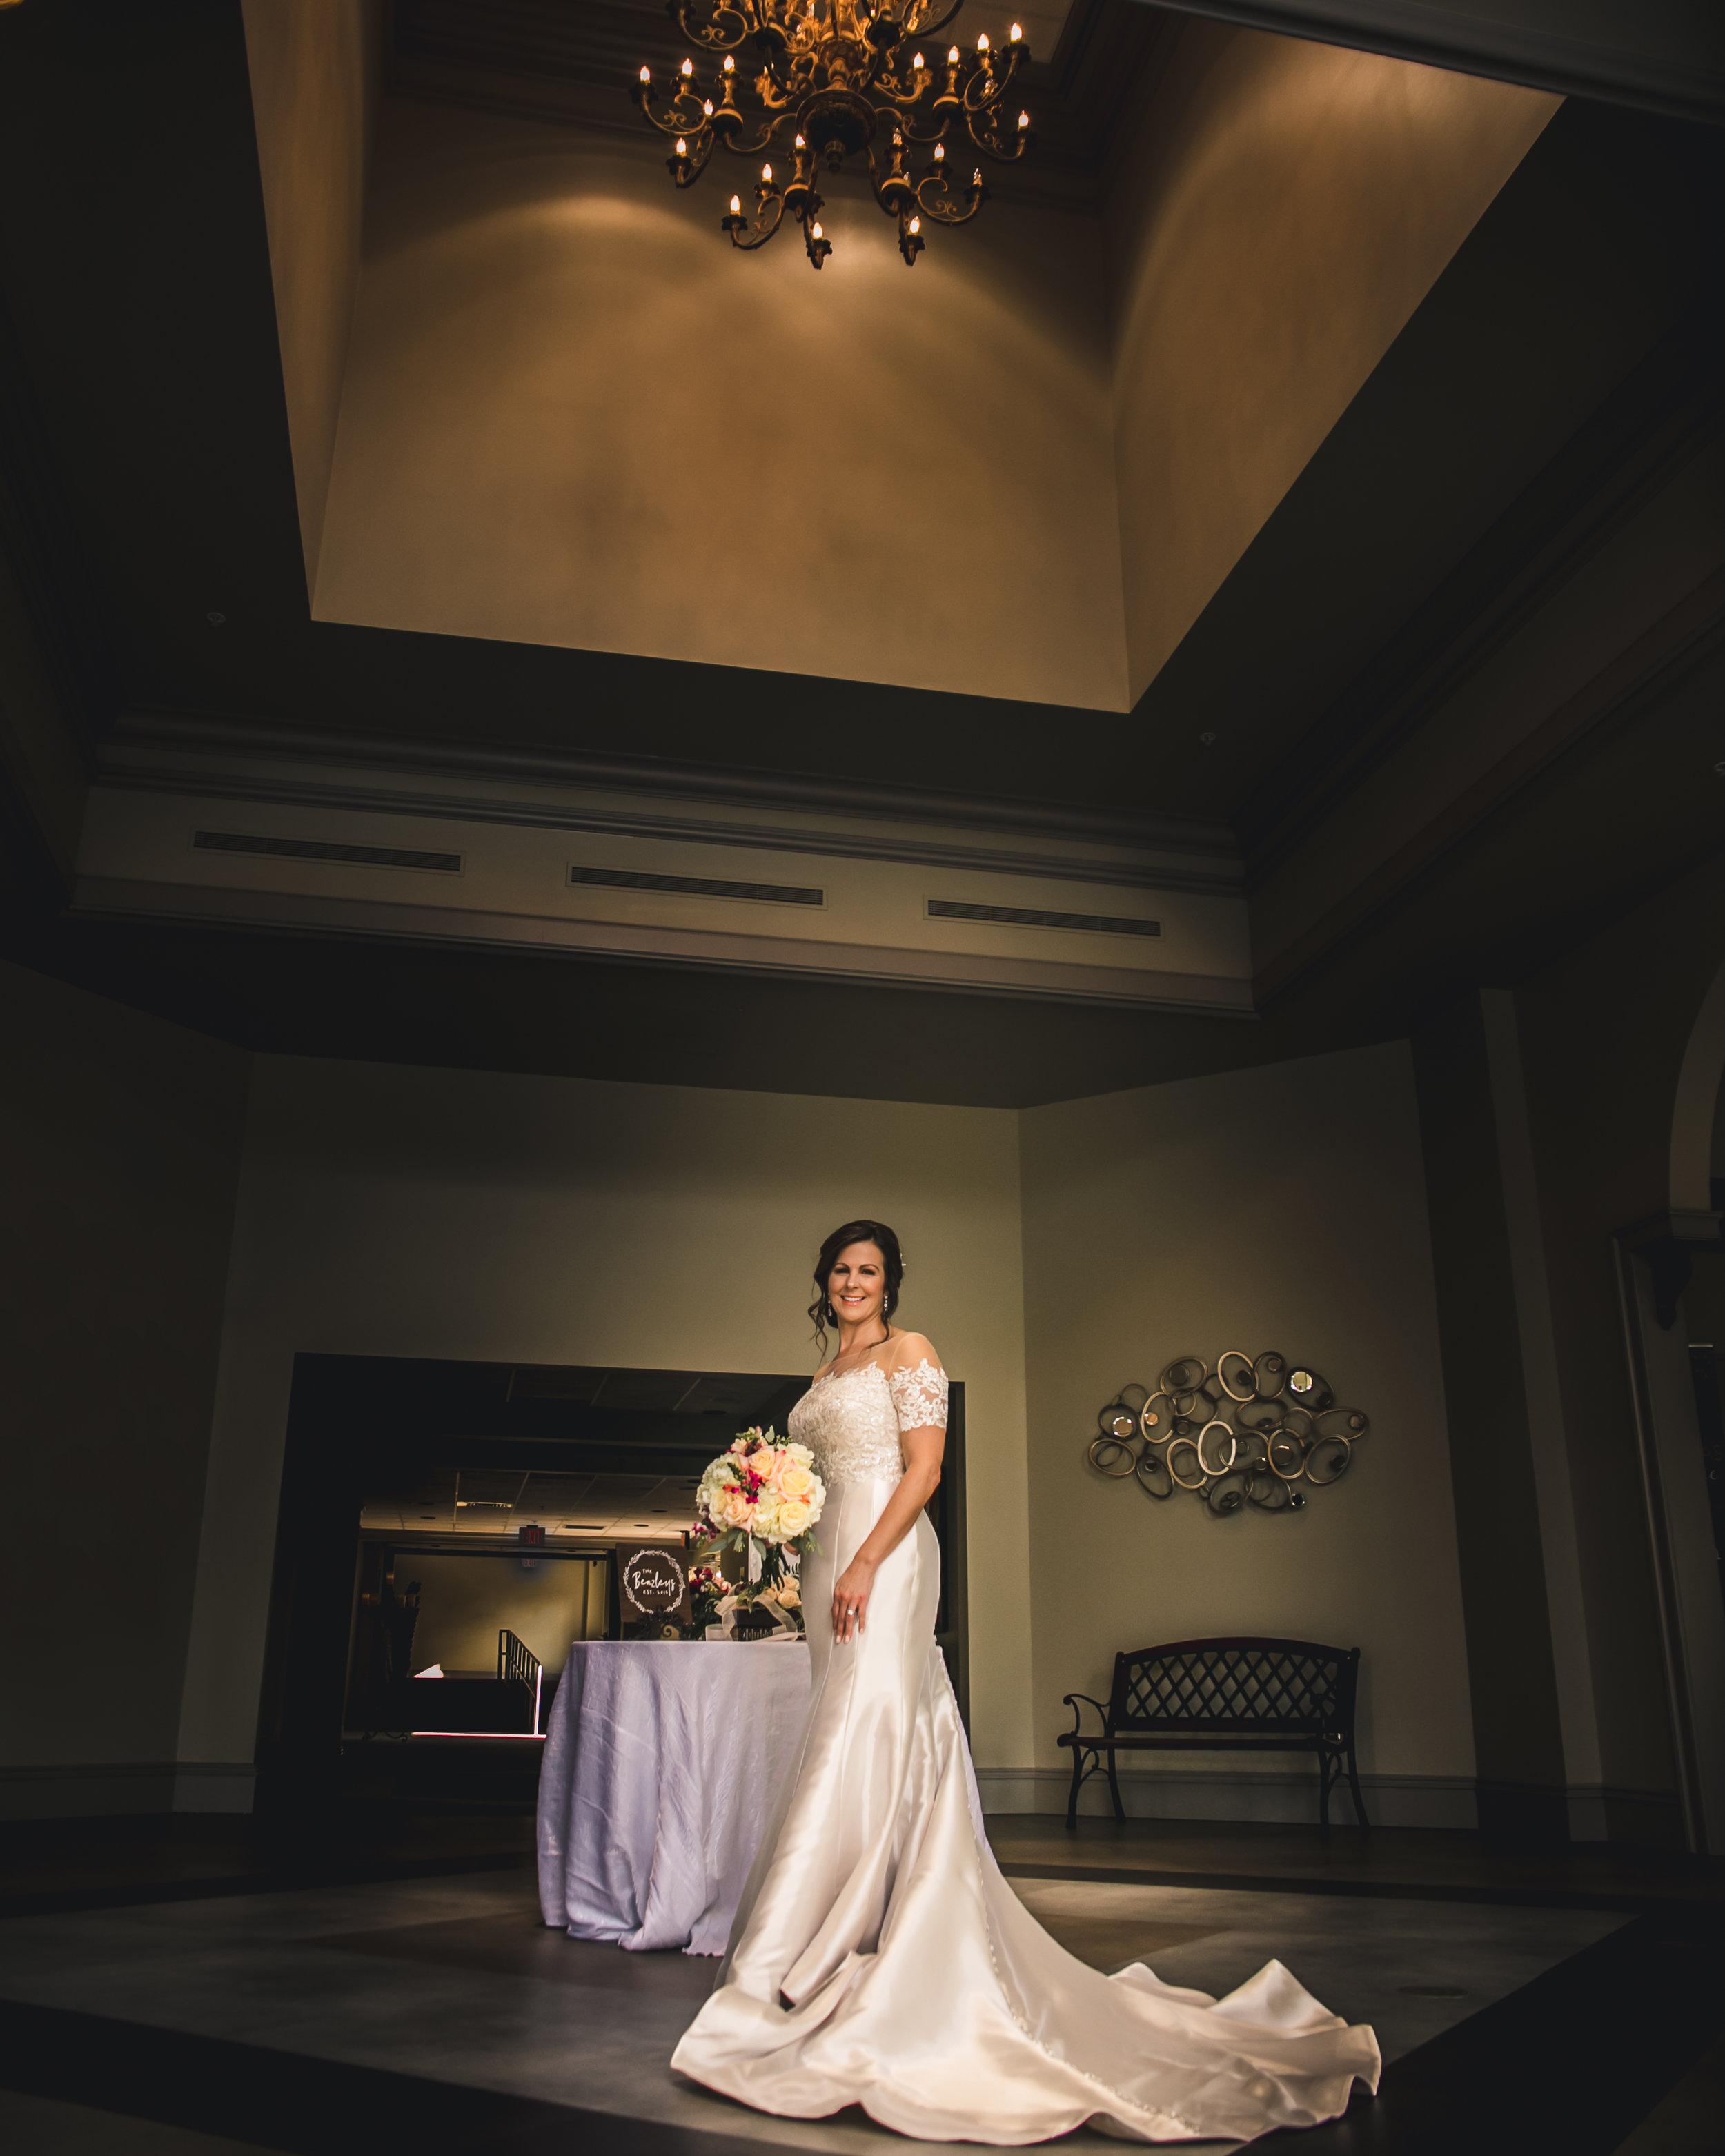 Nashville_Wedding_Photographers_DJ_Lighting_Bowling_Franklin (105 of 168).jpg